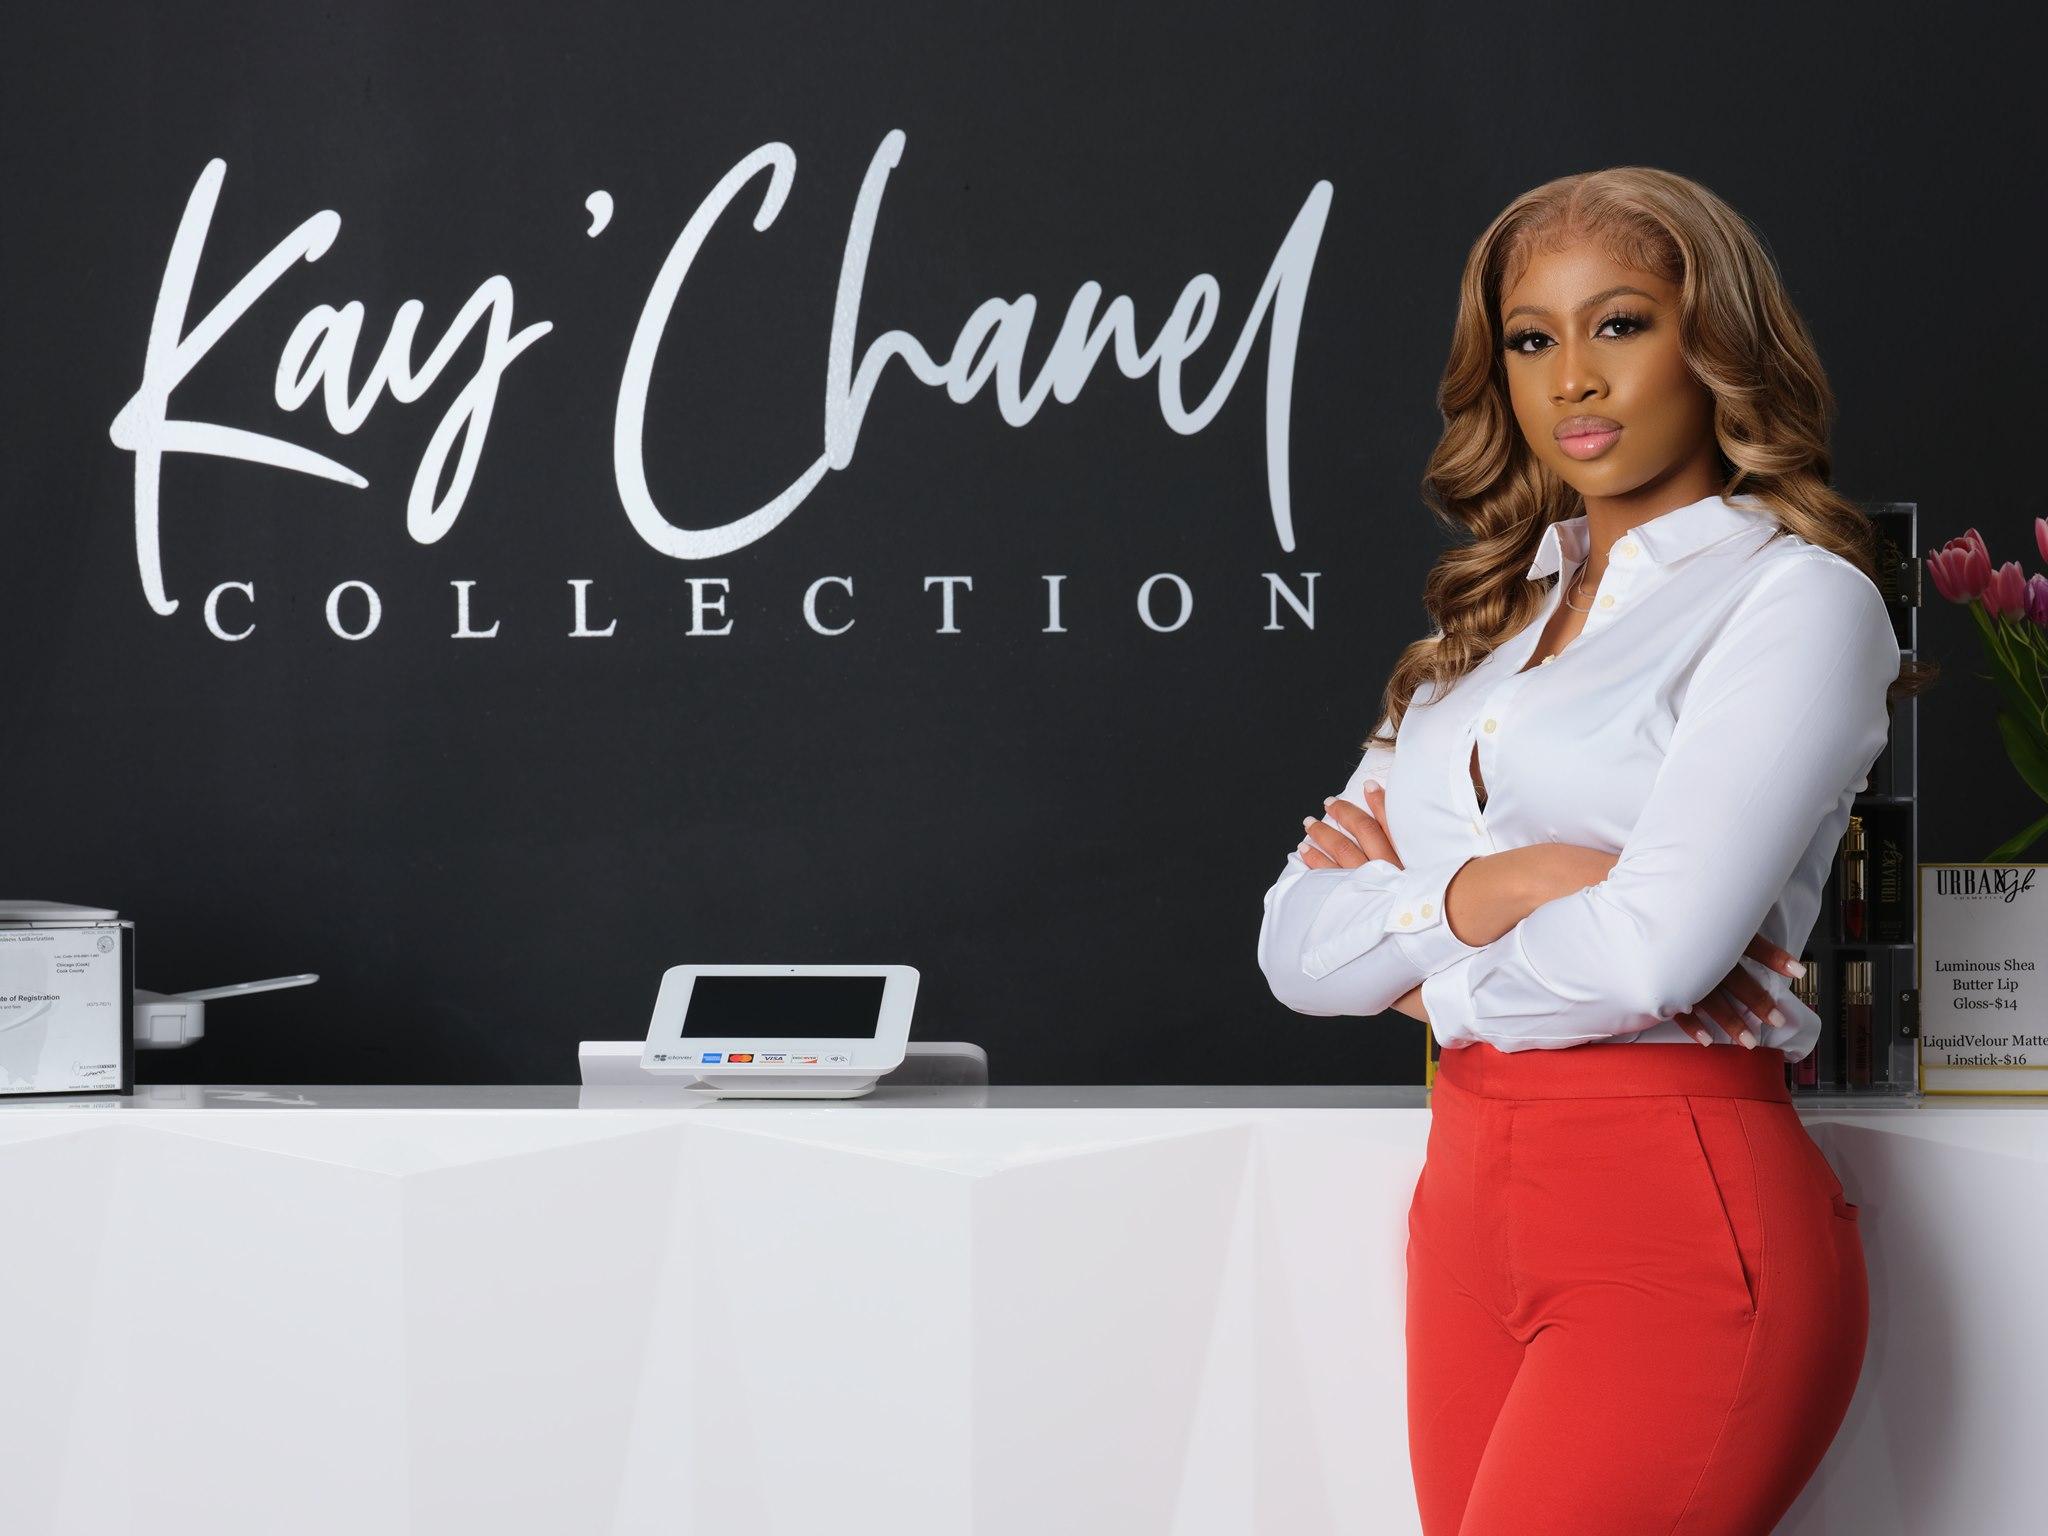 Kay'Chanel Collection Logo